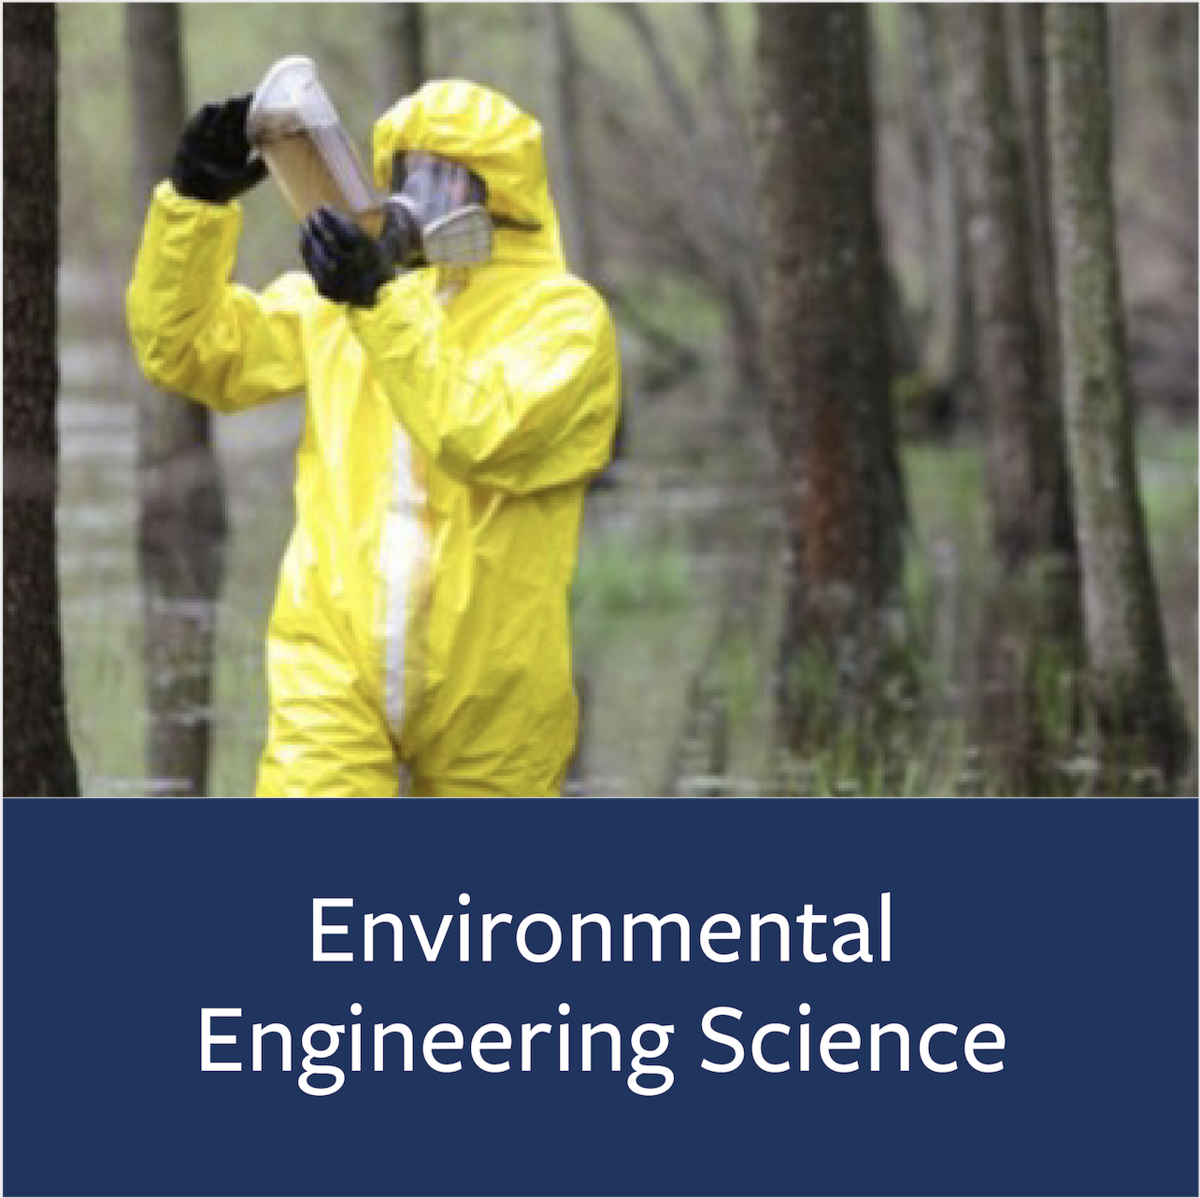 Environmental Engineering Science Major Map